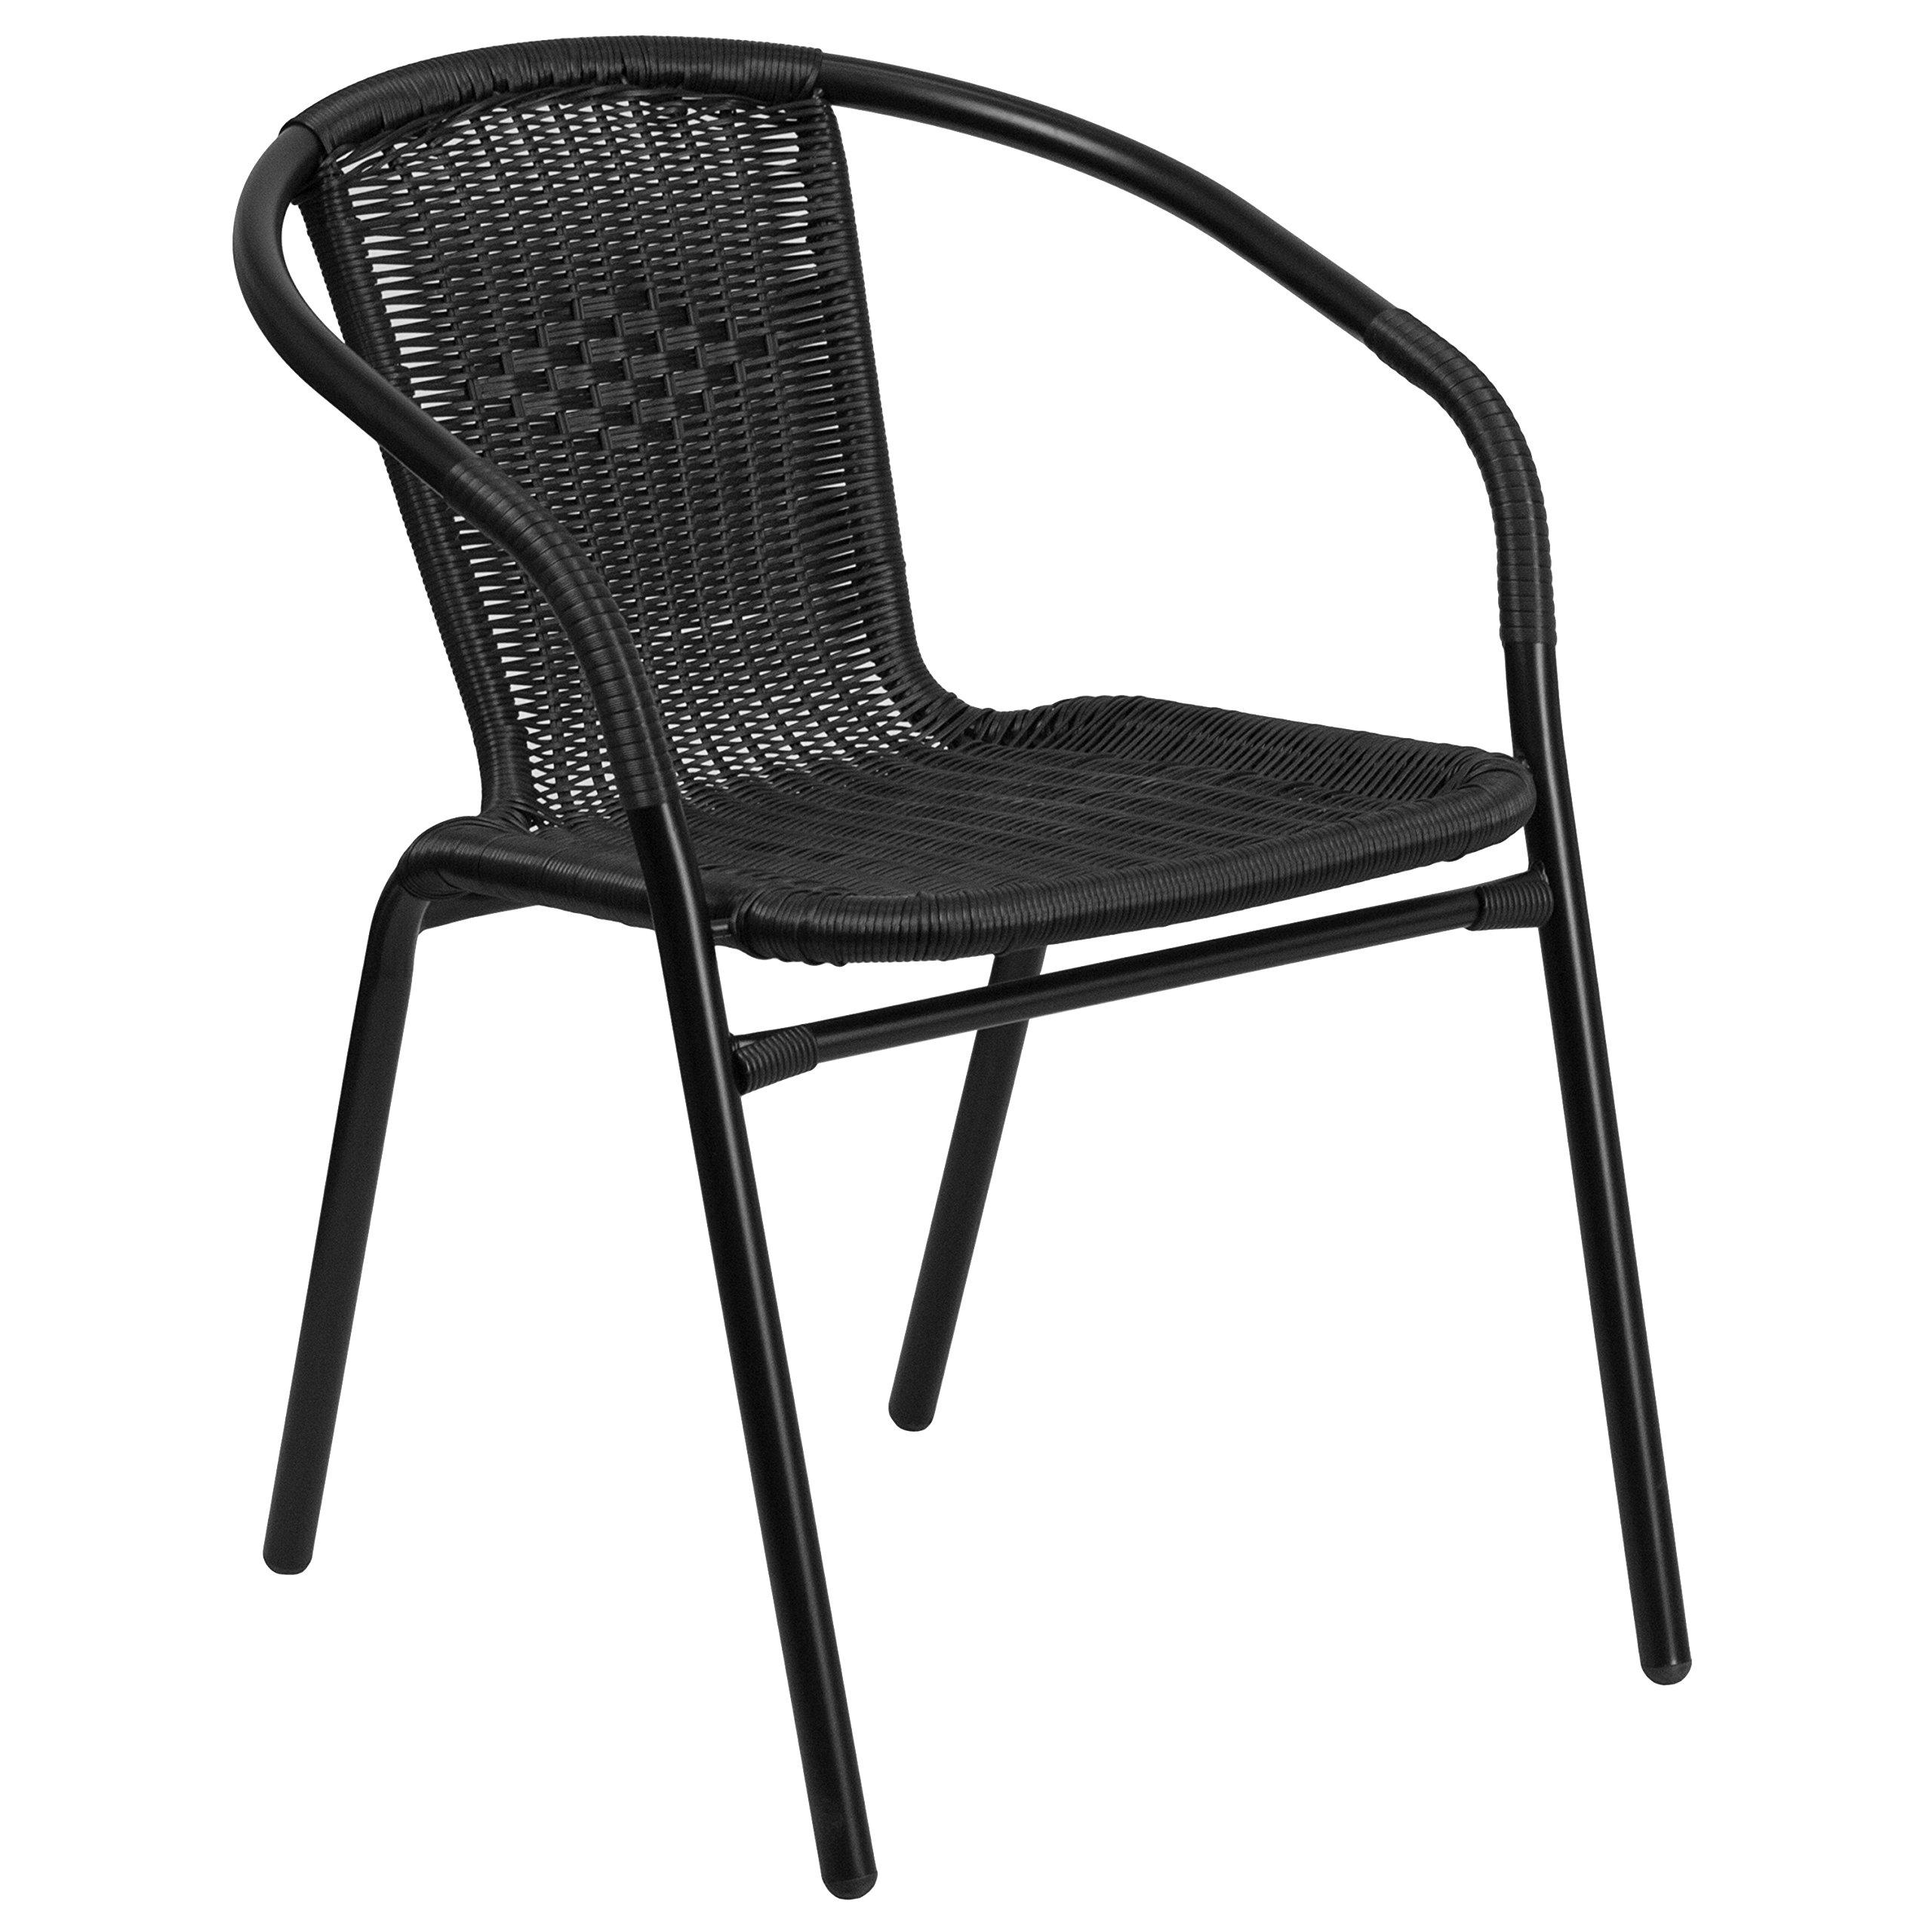 Flash Furniture Black Rattan Indoor-Outdoor Restaurant Stack Chair by Flash Furniture